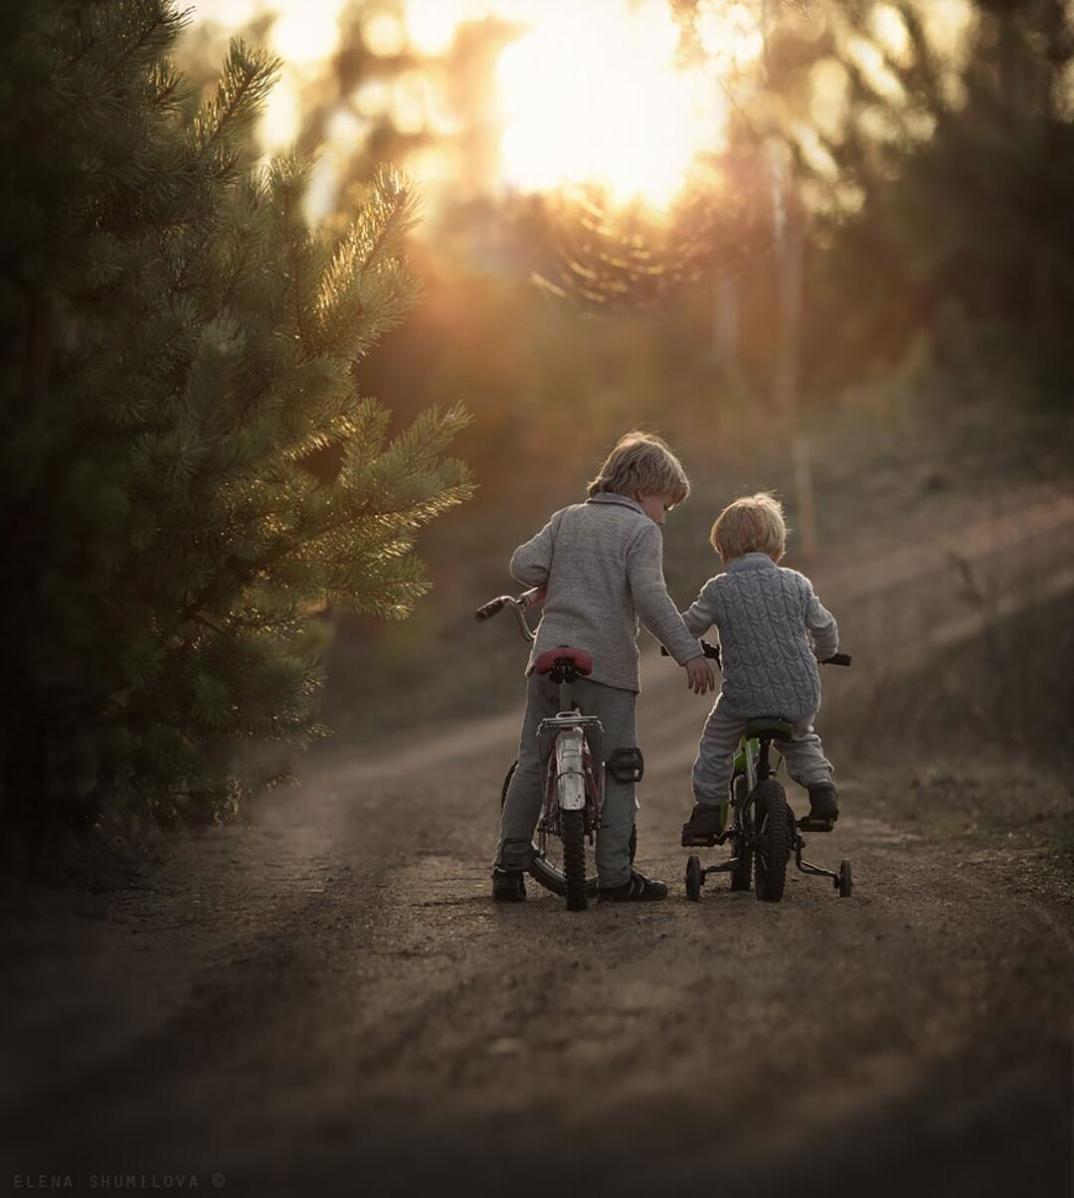 animali-bambini-fotografia-elena-shumilova-05